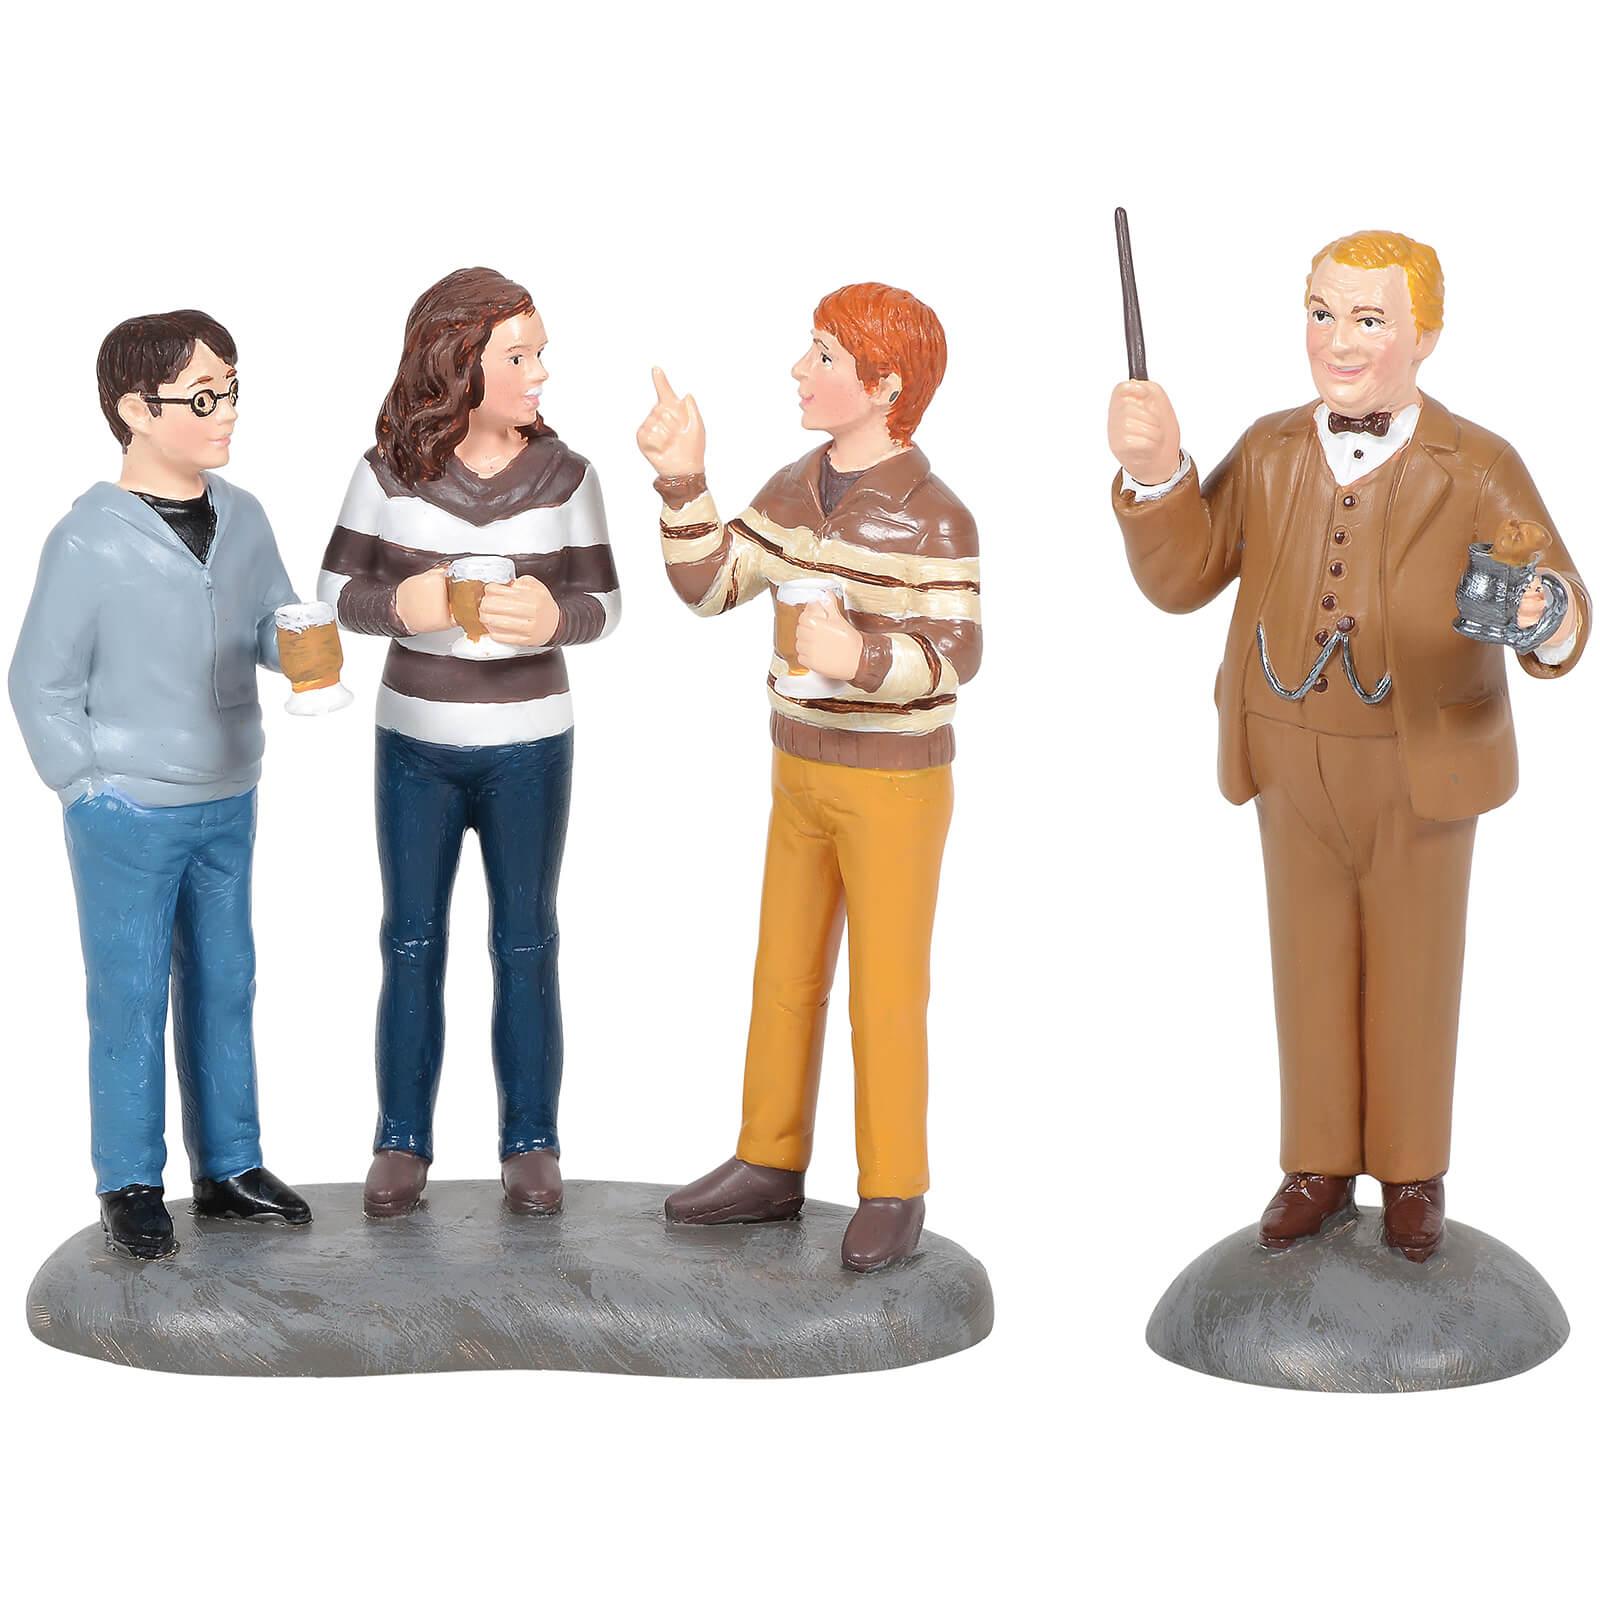 Image of Harry Potter Village Professor Slughorn and His Students 7cm